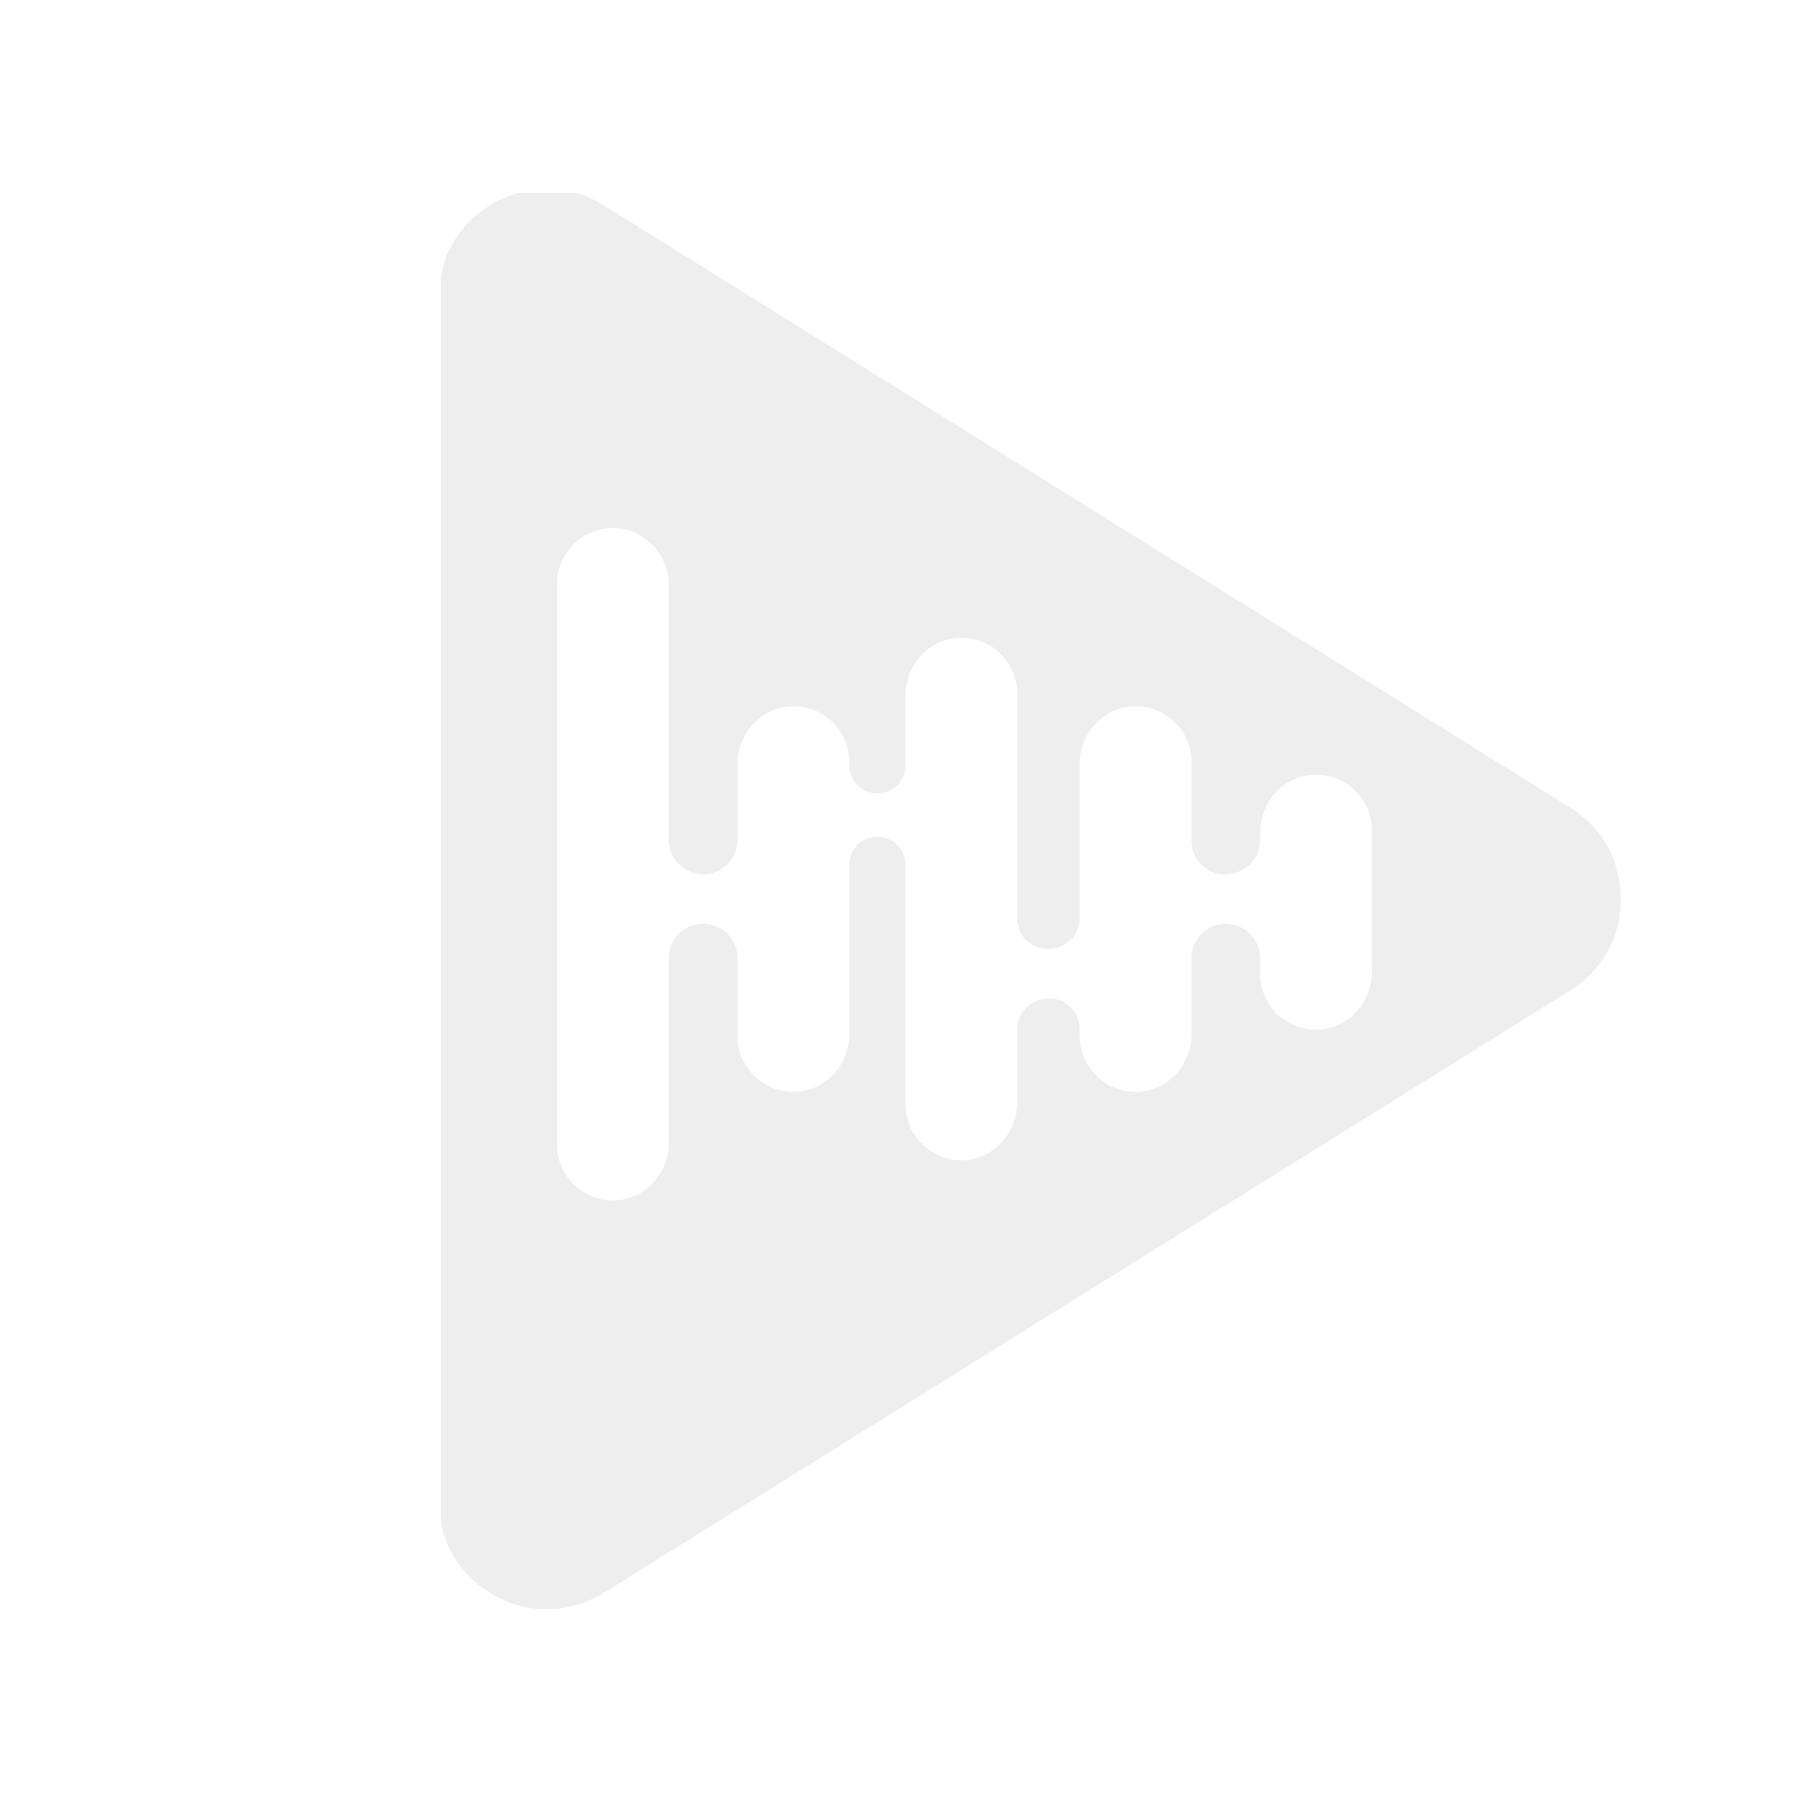 Connect C0001-AL32V